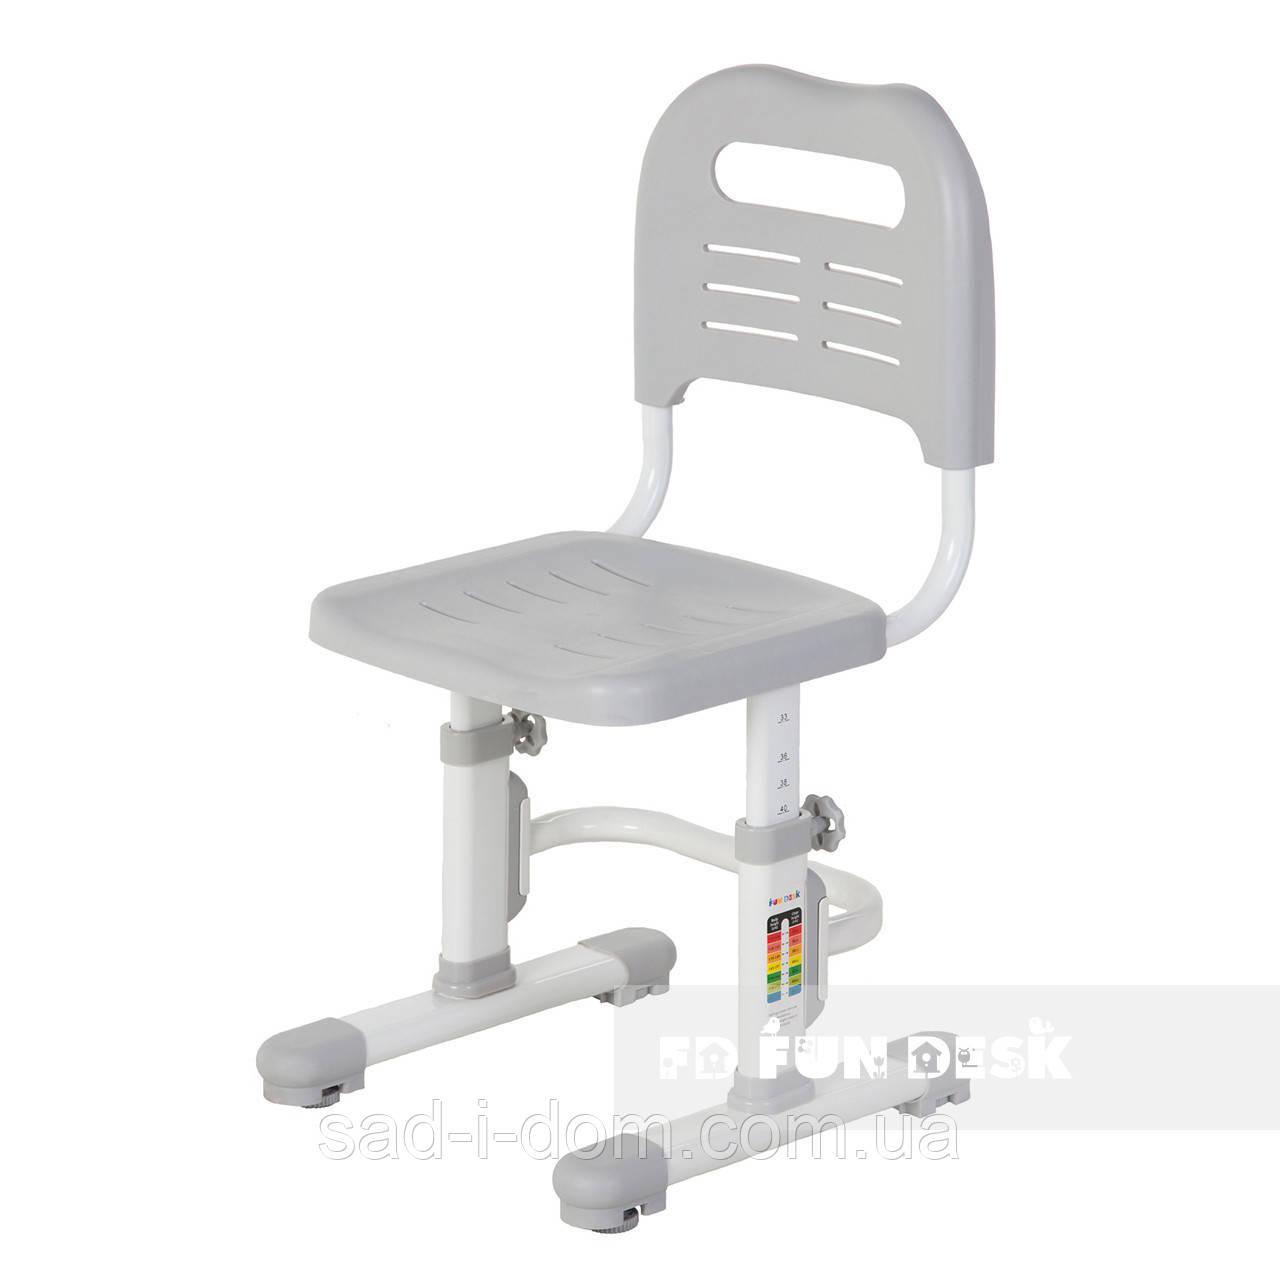 Детский стул растишка FunDesk SST3L, серый